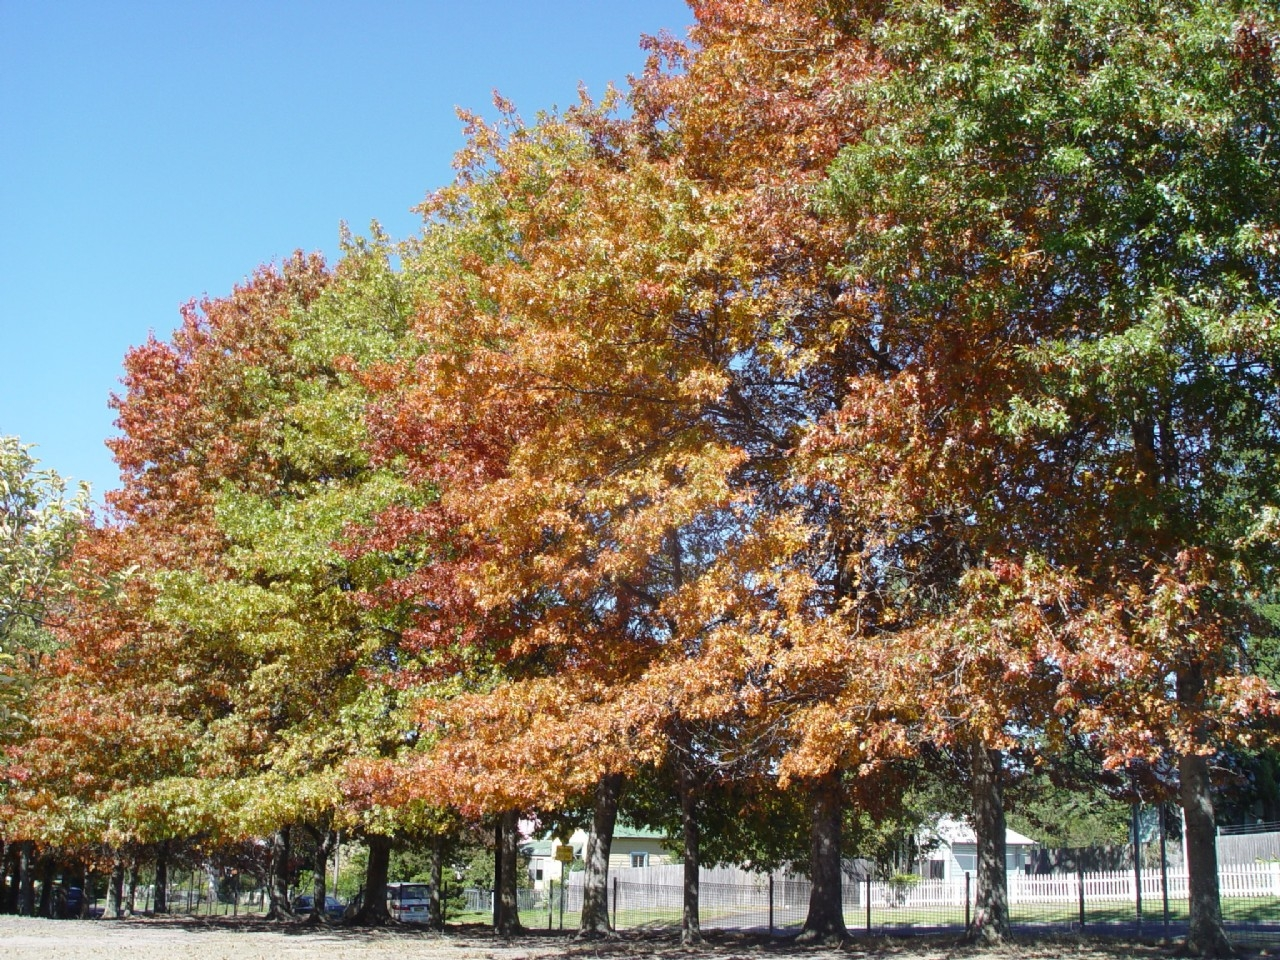 Lawson in autumn